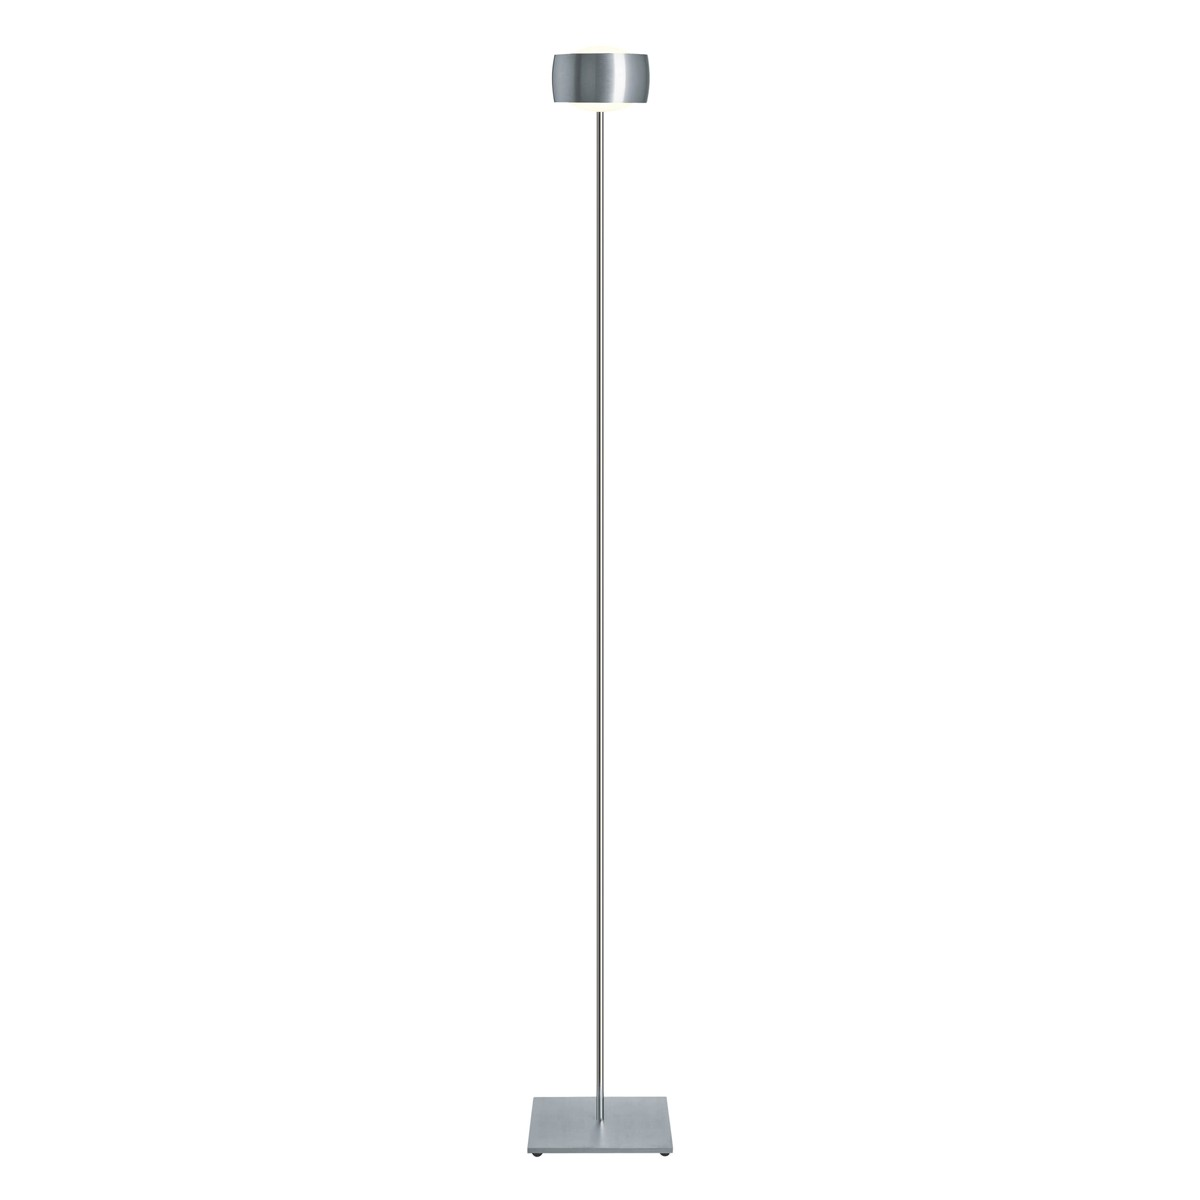 Oligo Grace LED Stehleuchte, Aluminium gebürstet